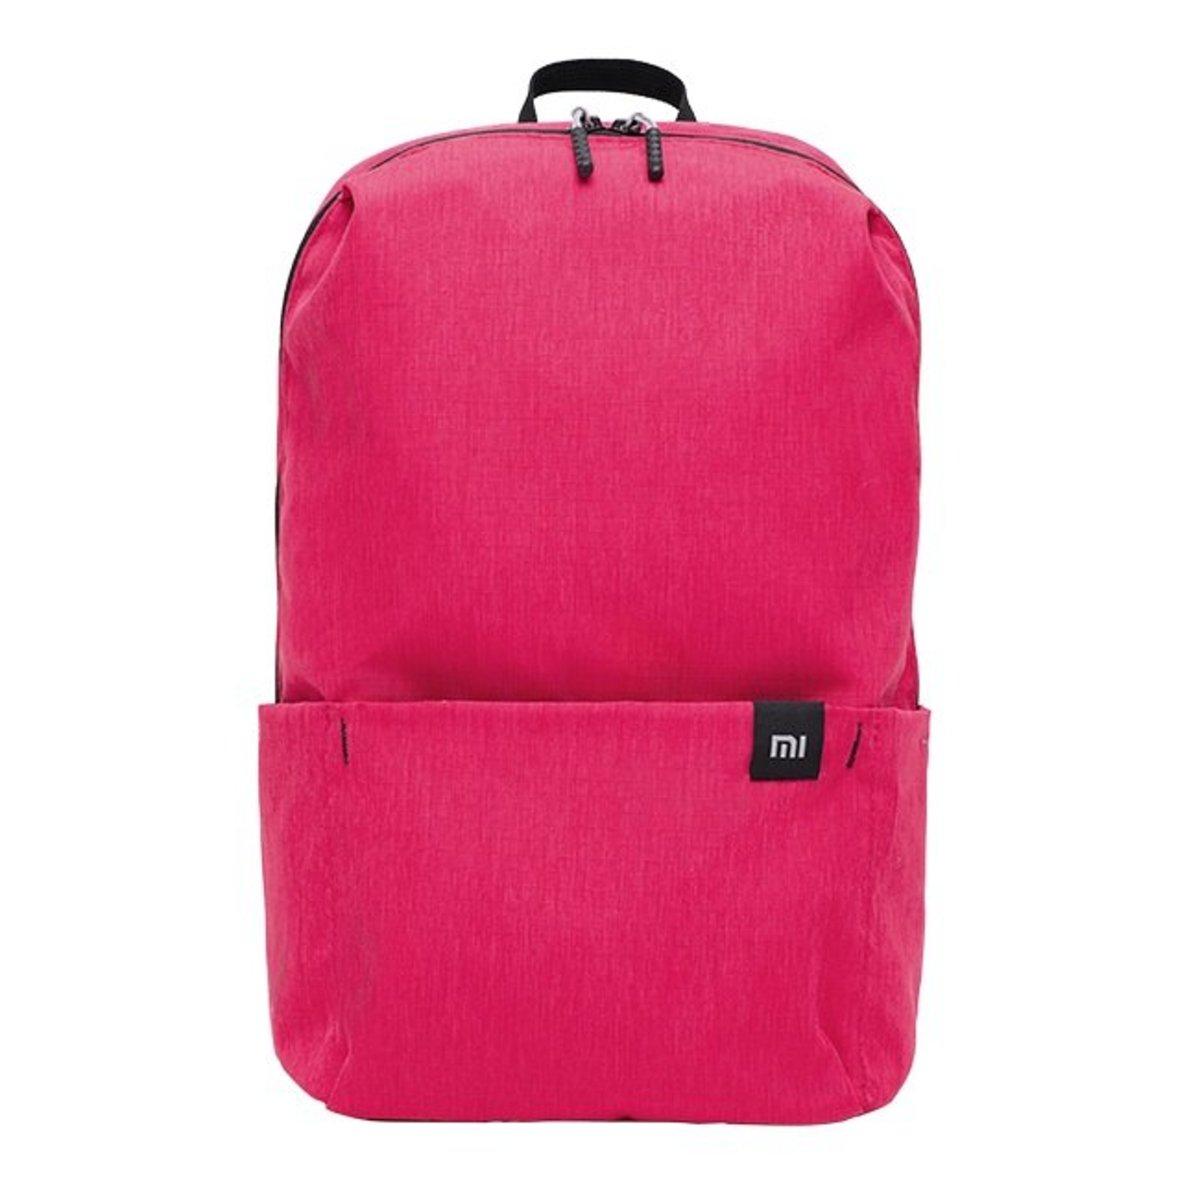 Water Resistant 10L Backpack Vivid Pink